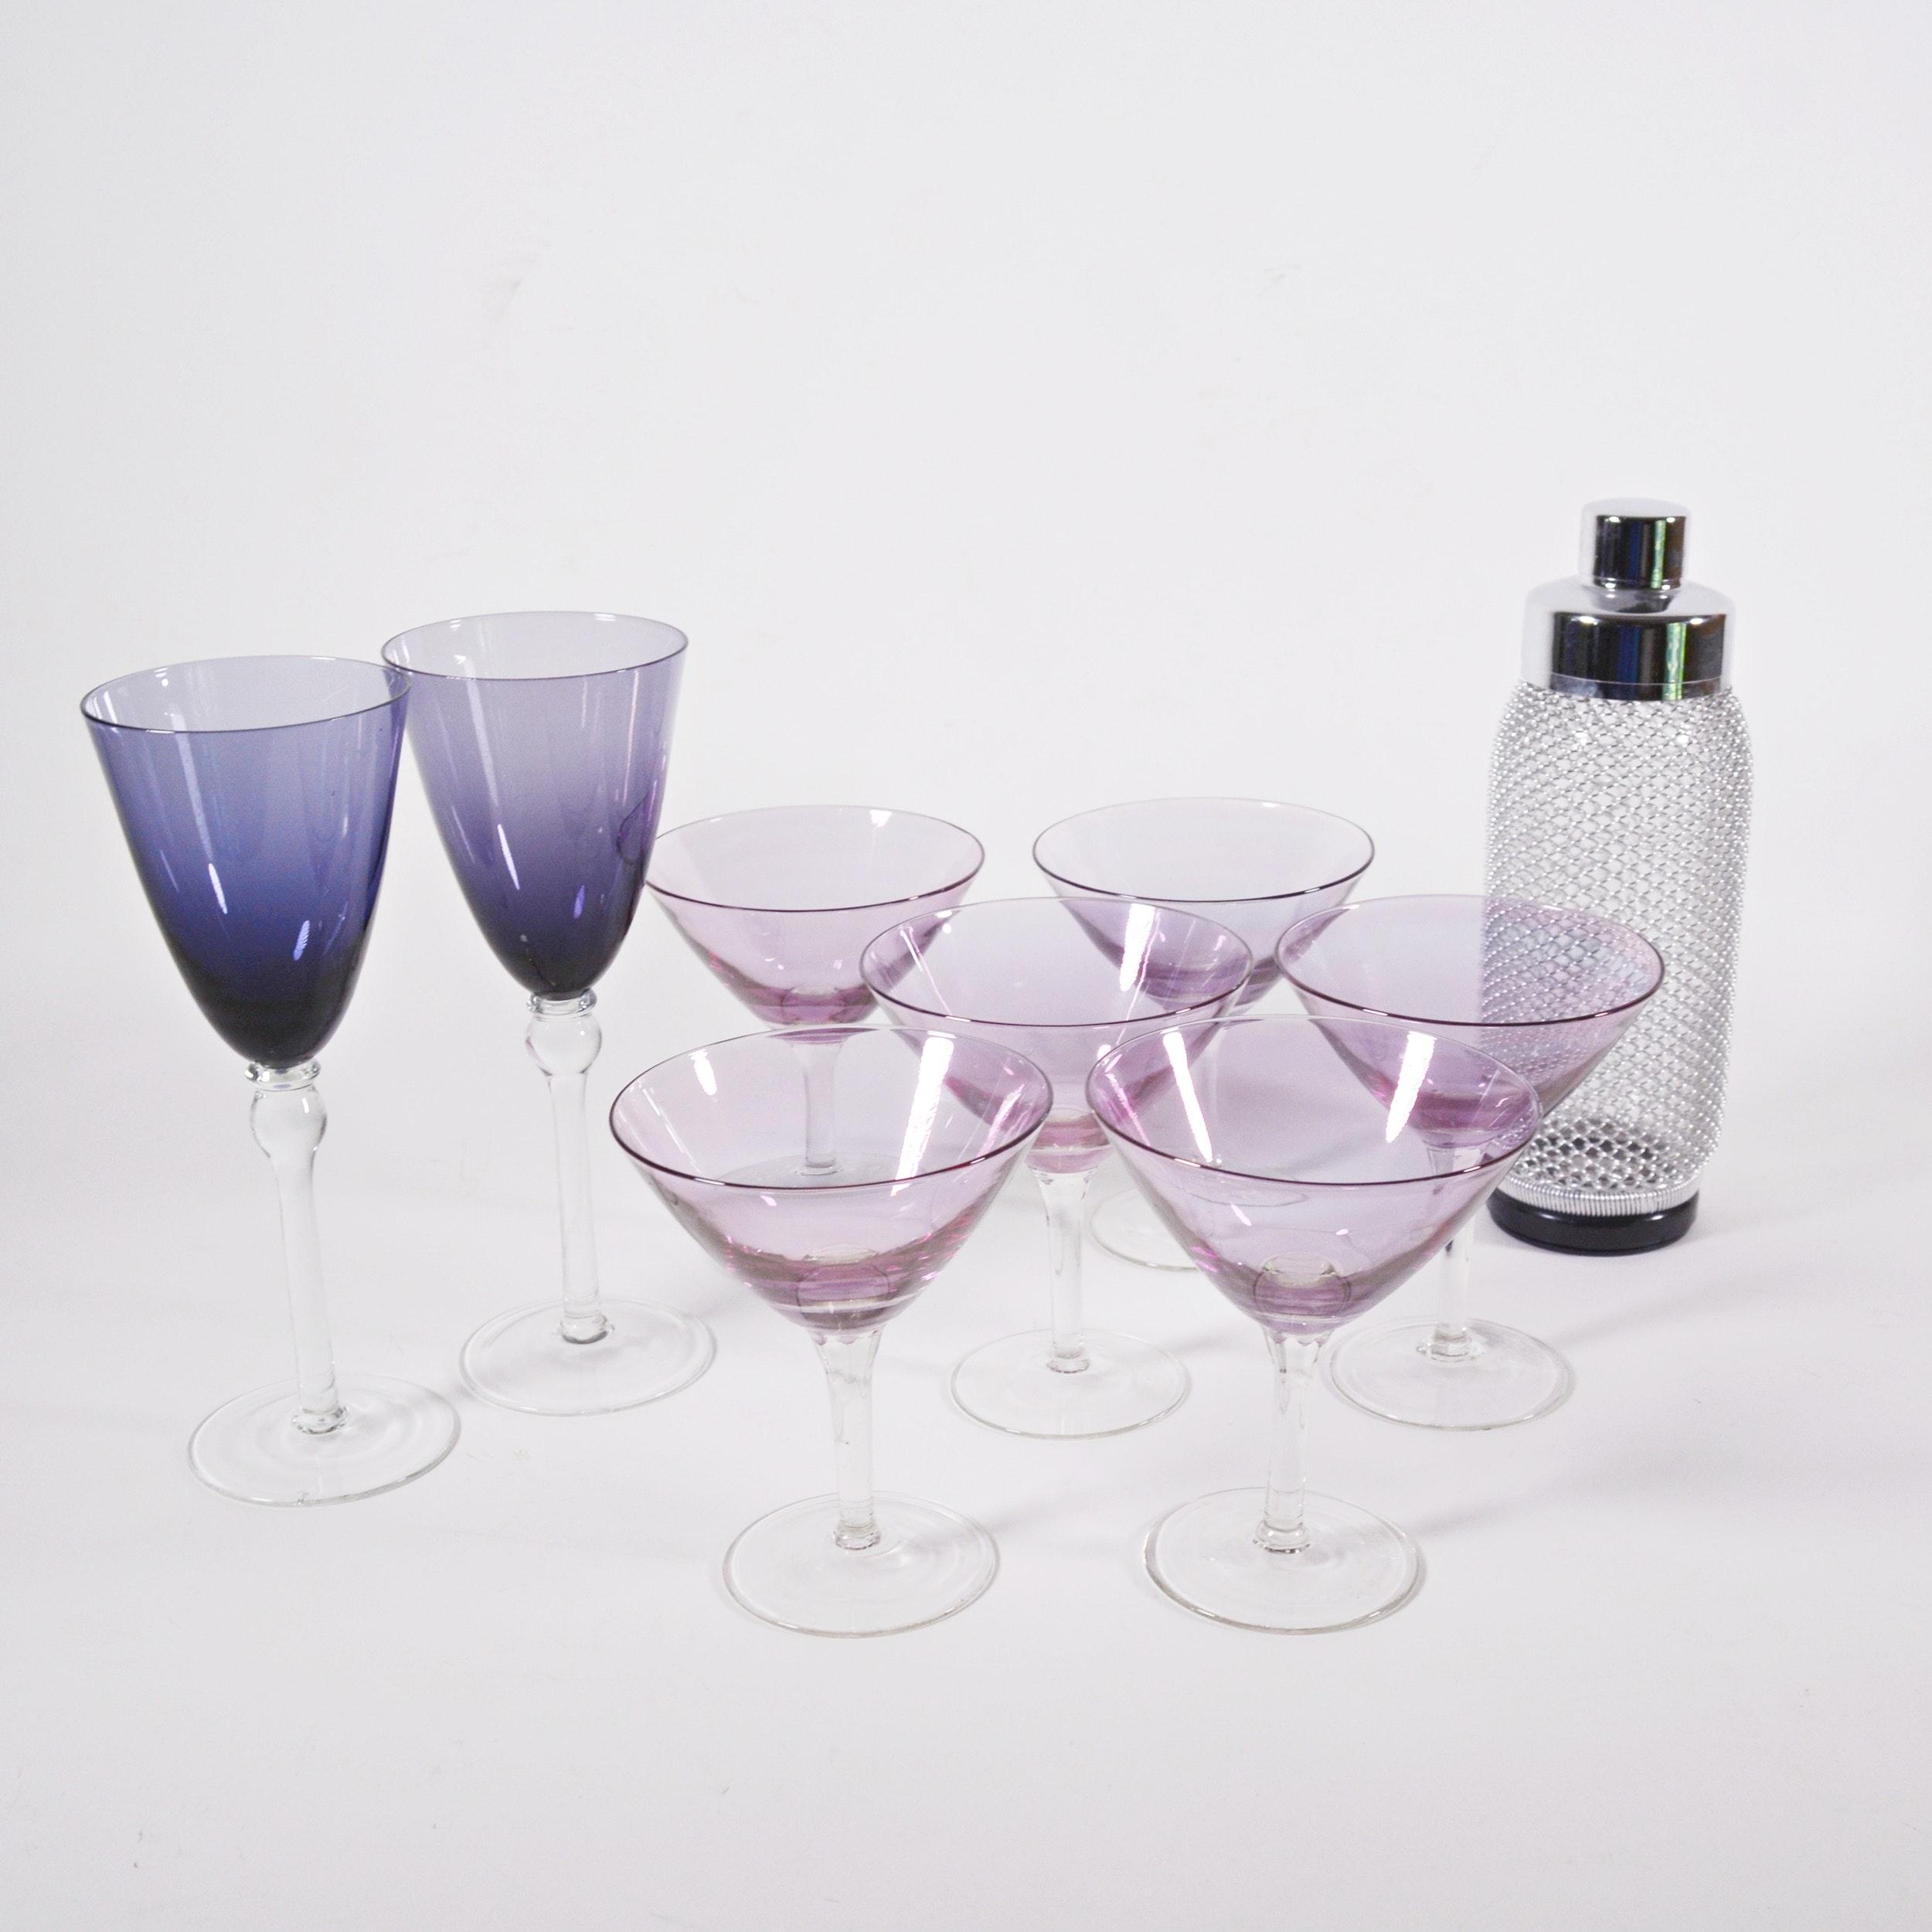 Martini Glasses and Shaker